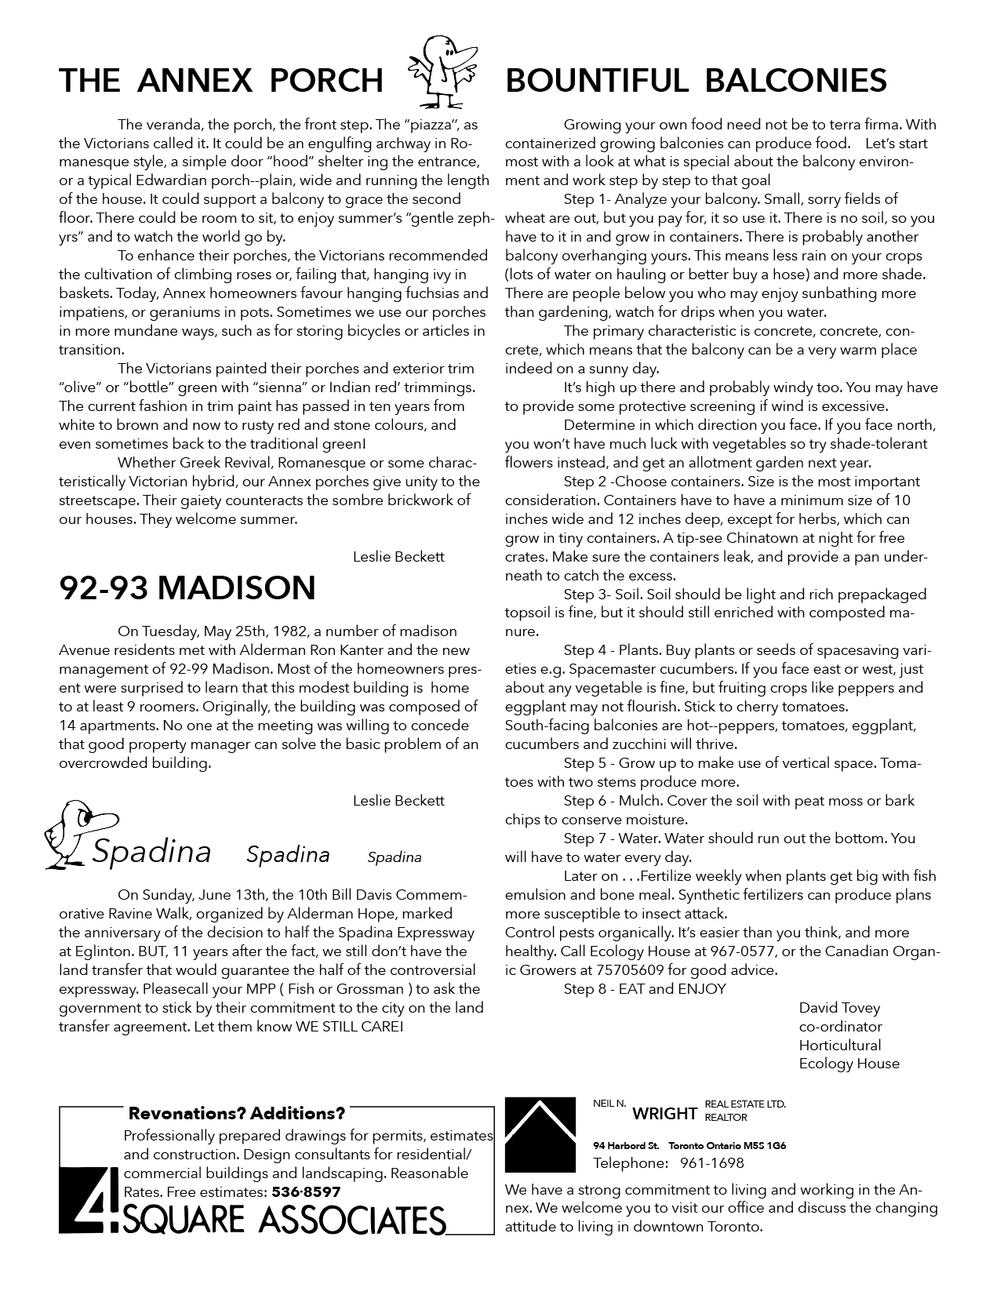 The Voice June 19822.jpg